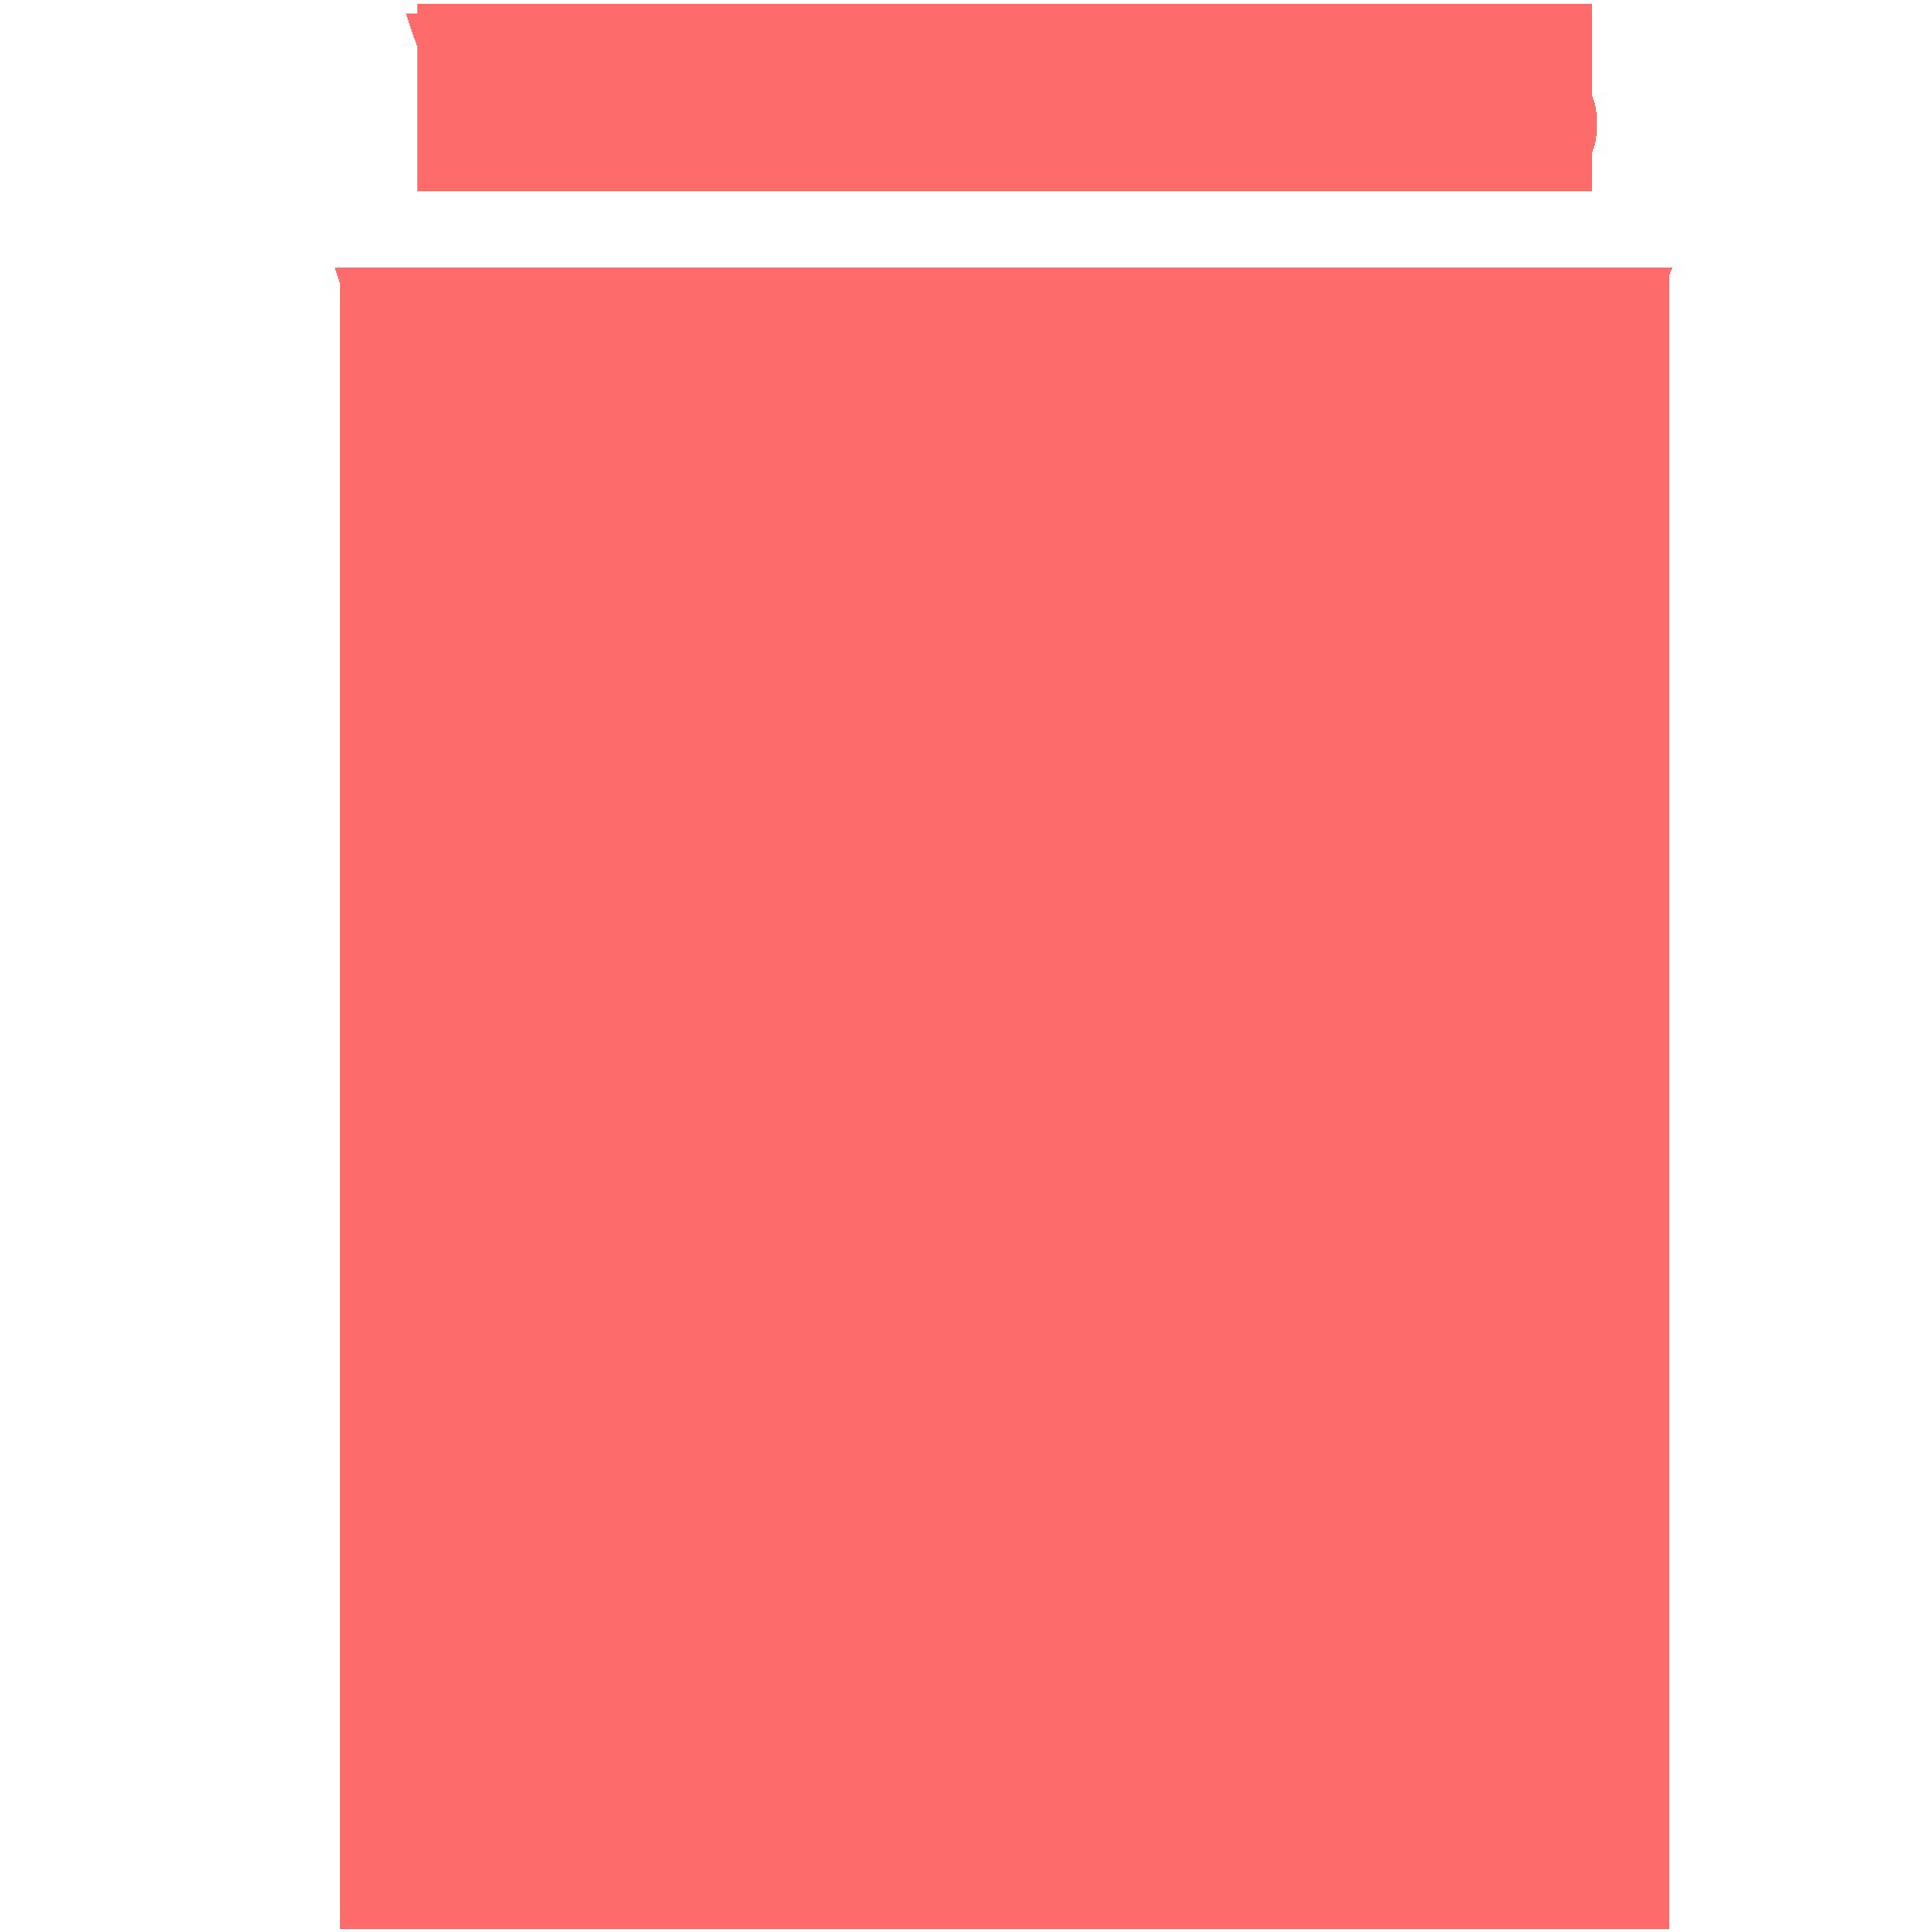 Vizion Studio